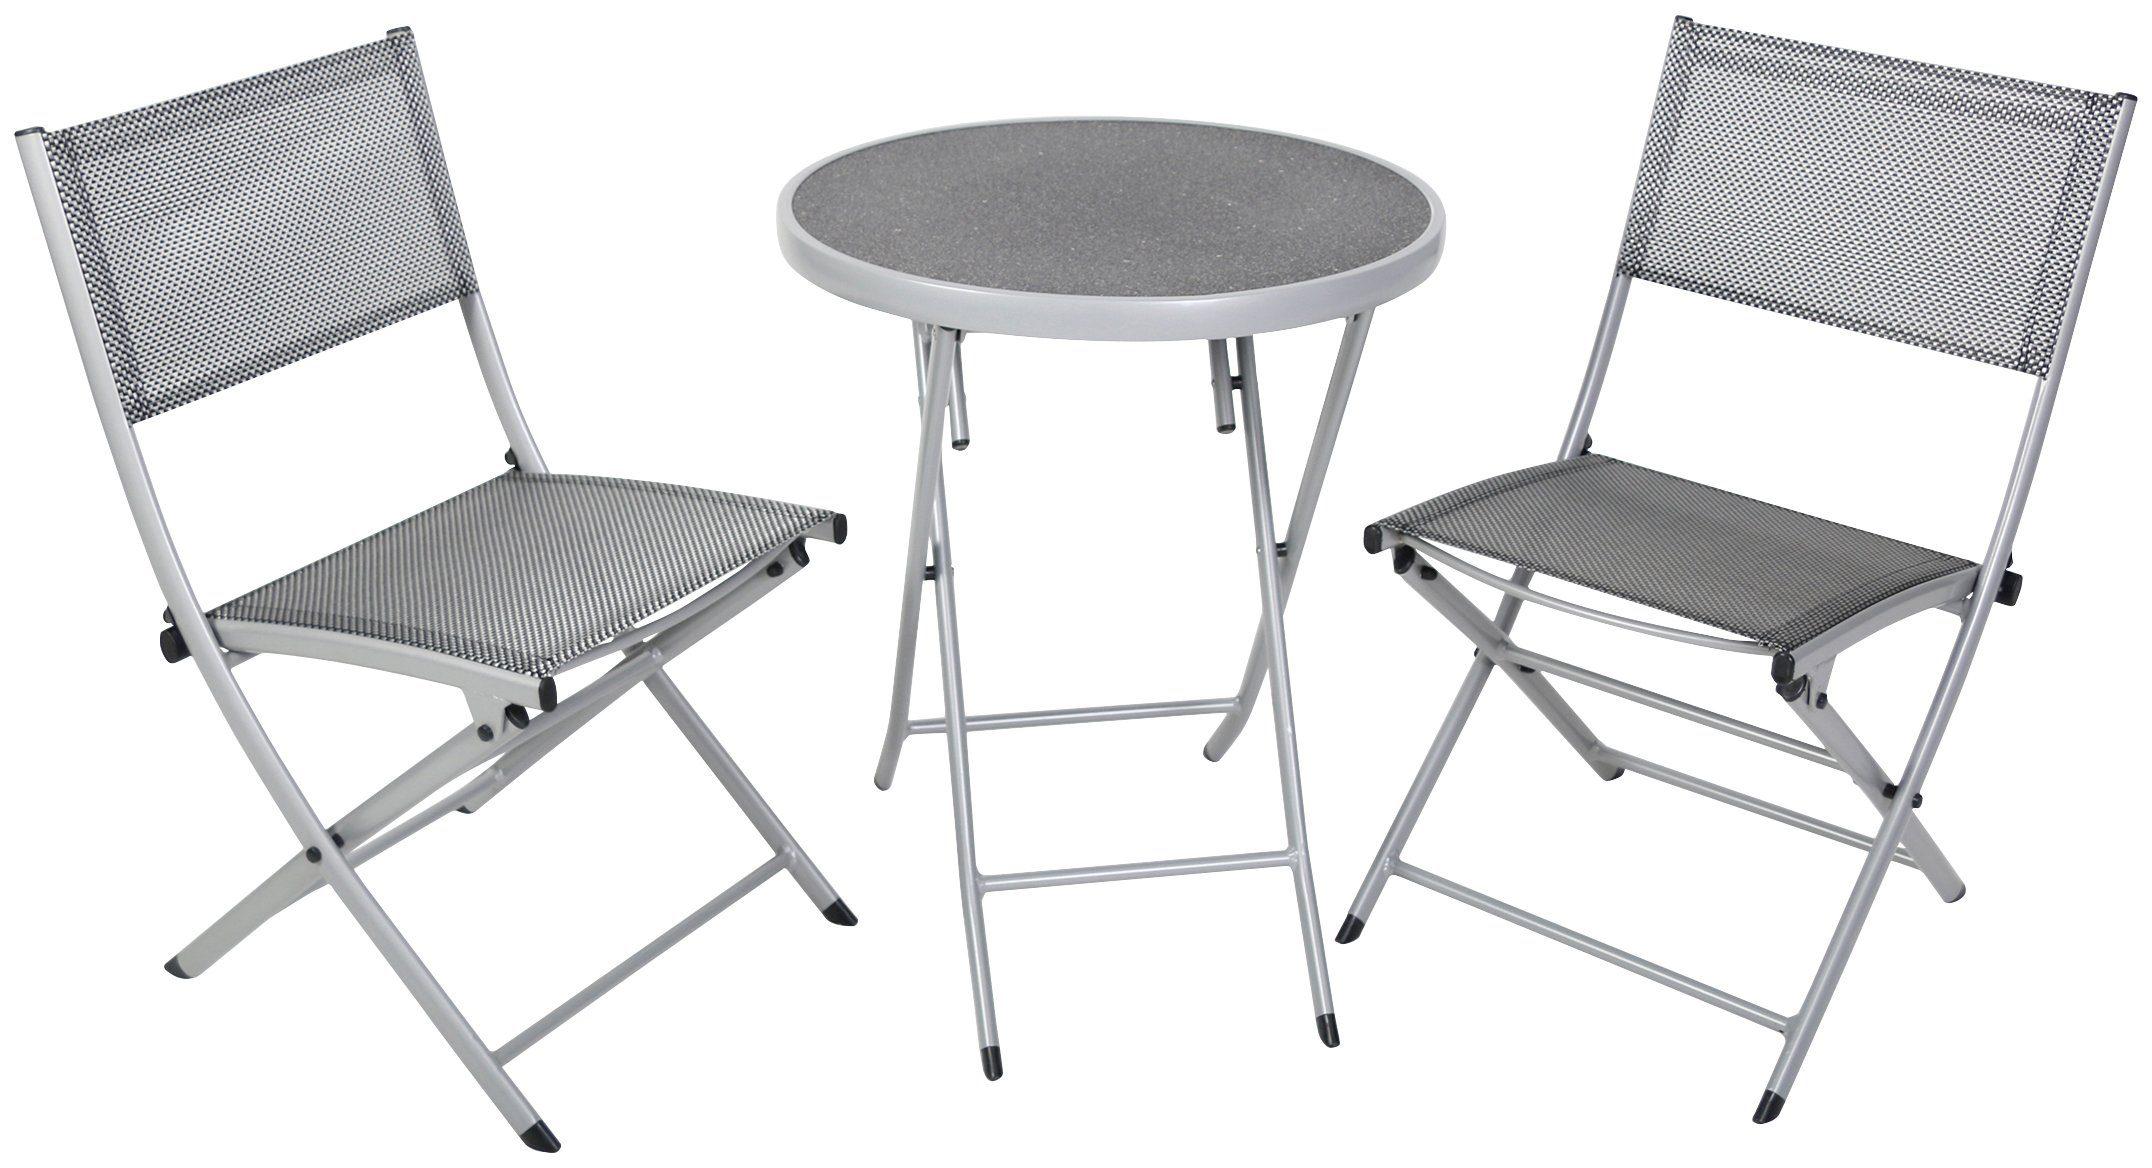 GREEMOTION Balkonset , 3-tlg., 2 Stühle, Tisch 60x60 cm, Alu/Textil